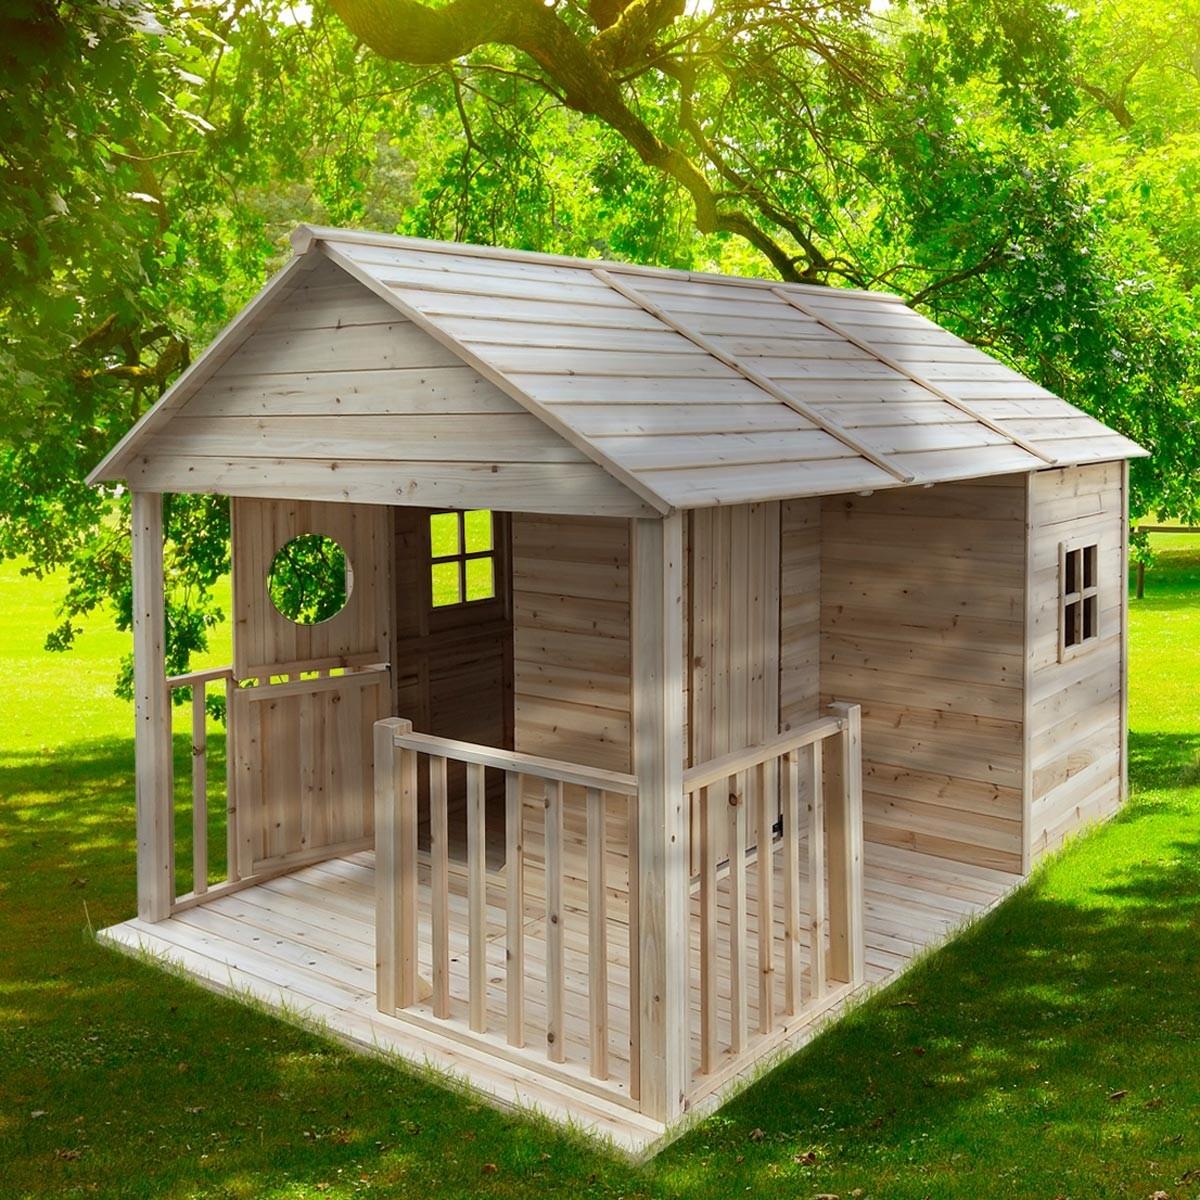 Full Size of Garten Spielhaus Holz Cottage Brast24de Pergola Pavillon Loungemöbel Spielgerät Bewässerungssystem Sichtschutz Im Paravent Led Spot Bewässerungssysteme Garten Garten Spielhaus